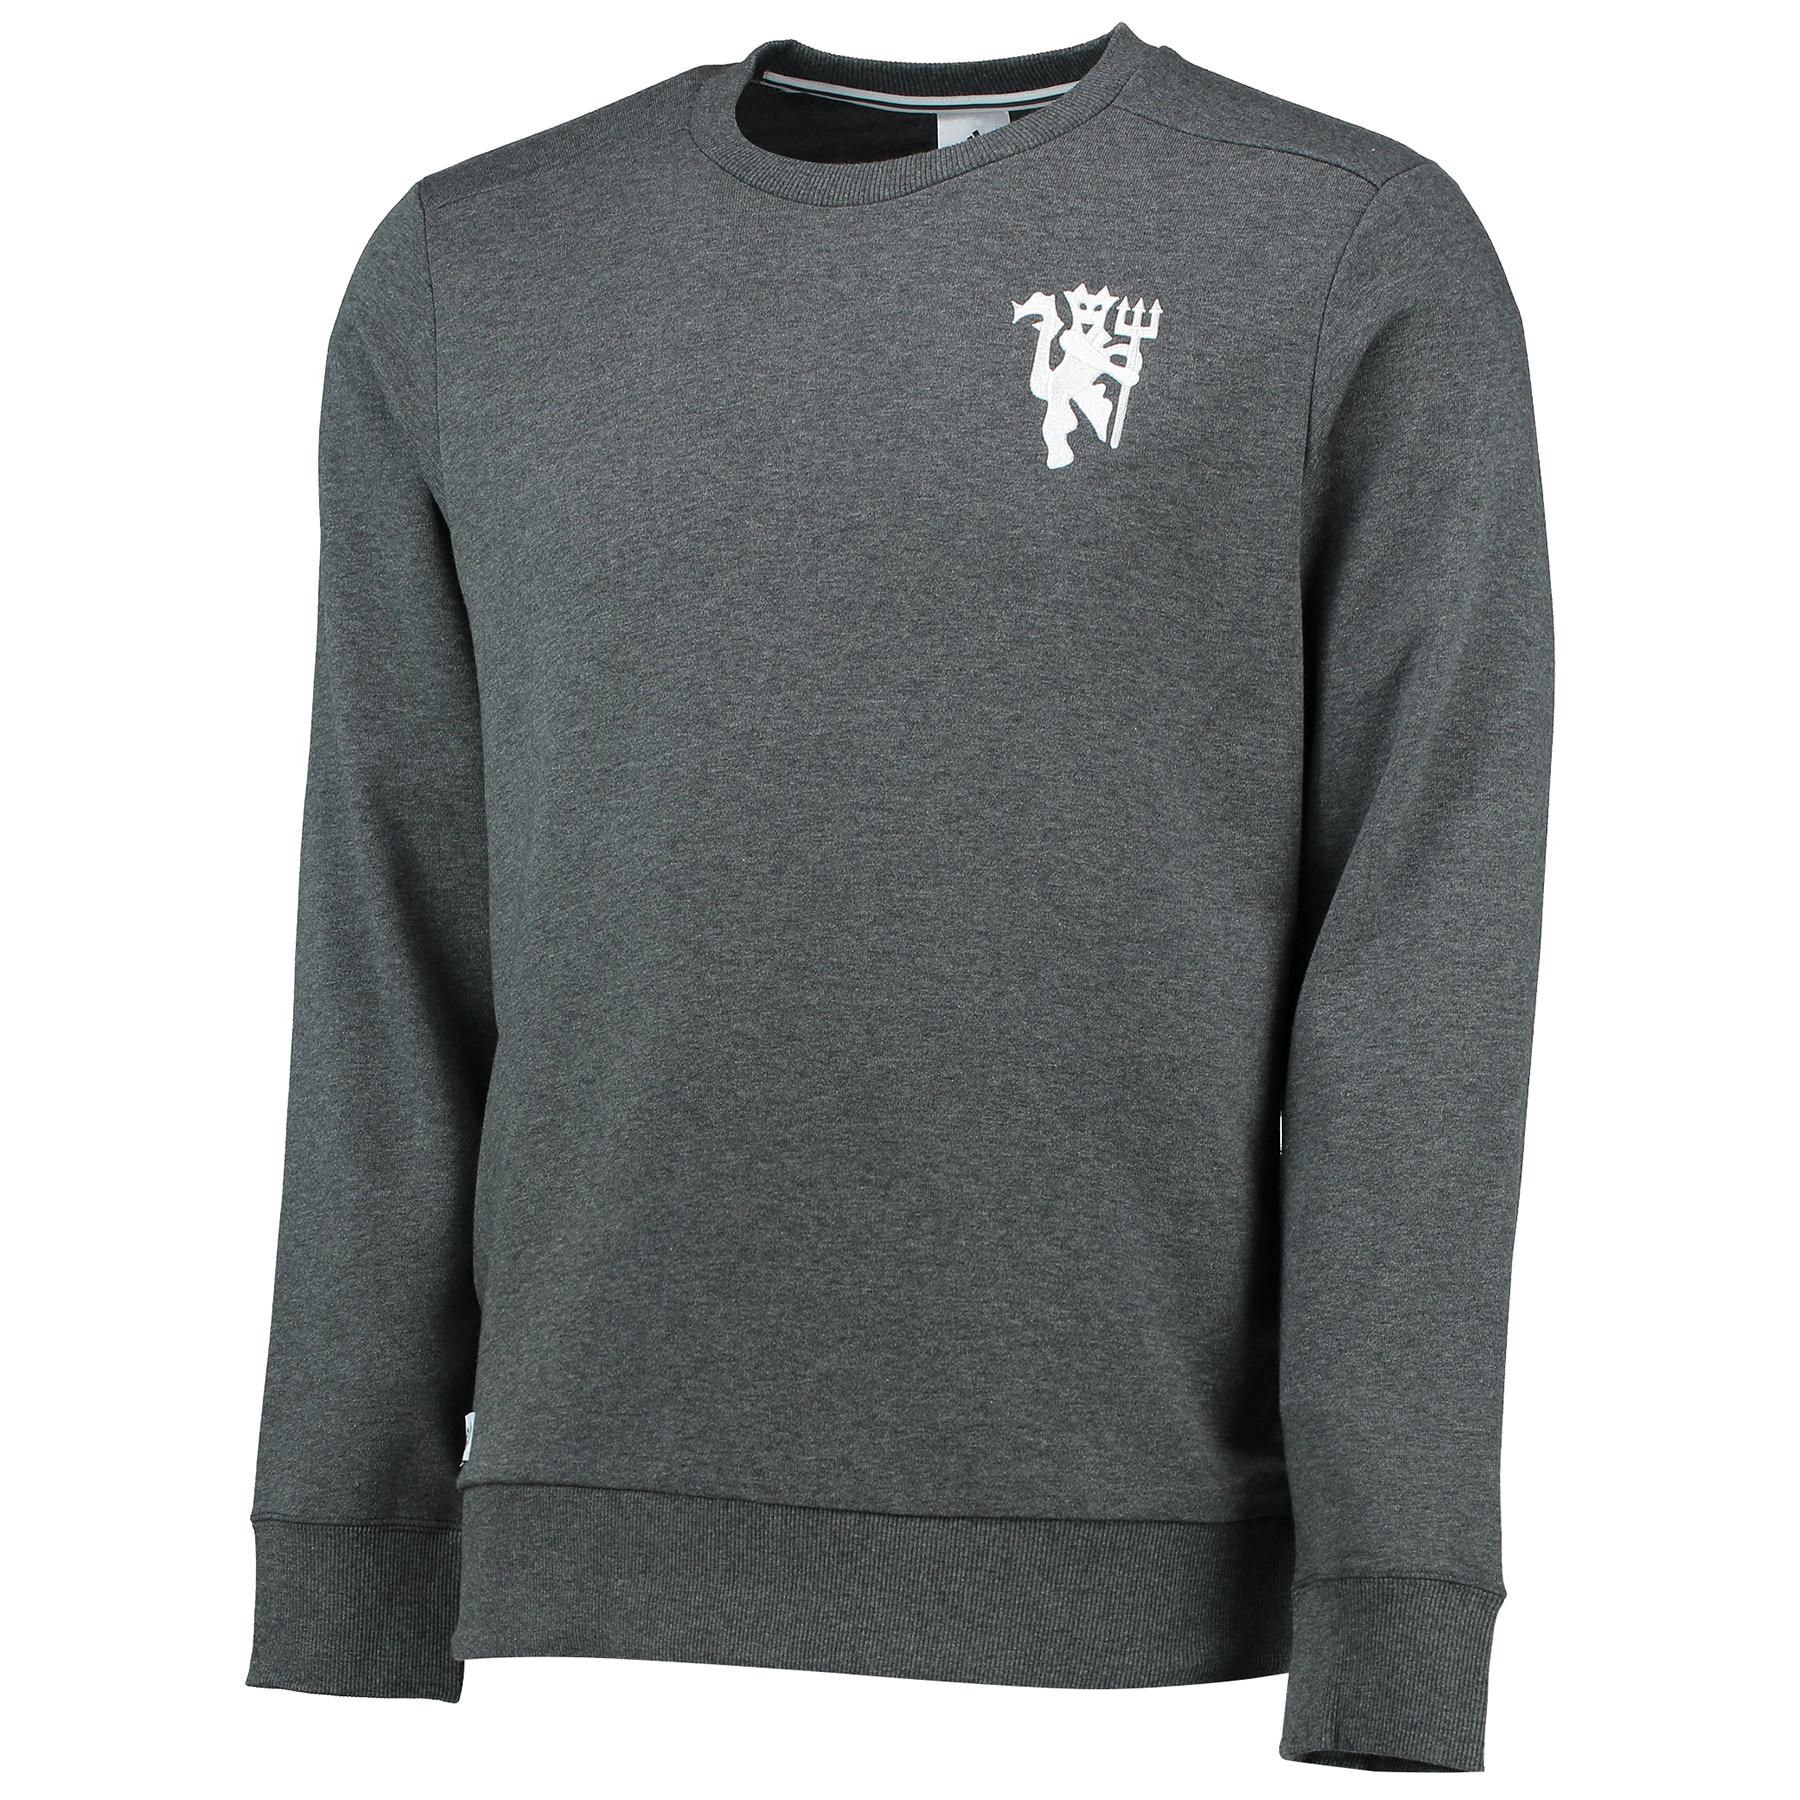 Manchester United Core Crew Sweatshirt - Dark Grey